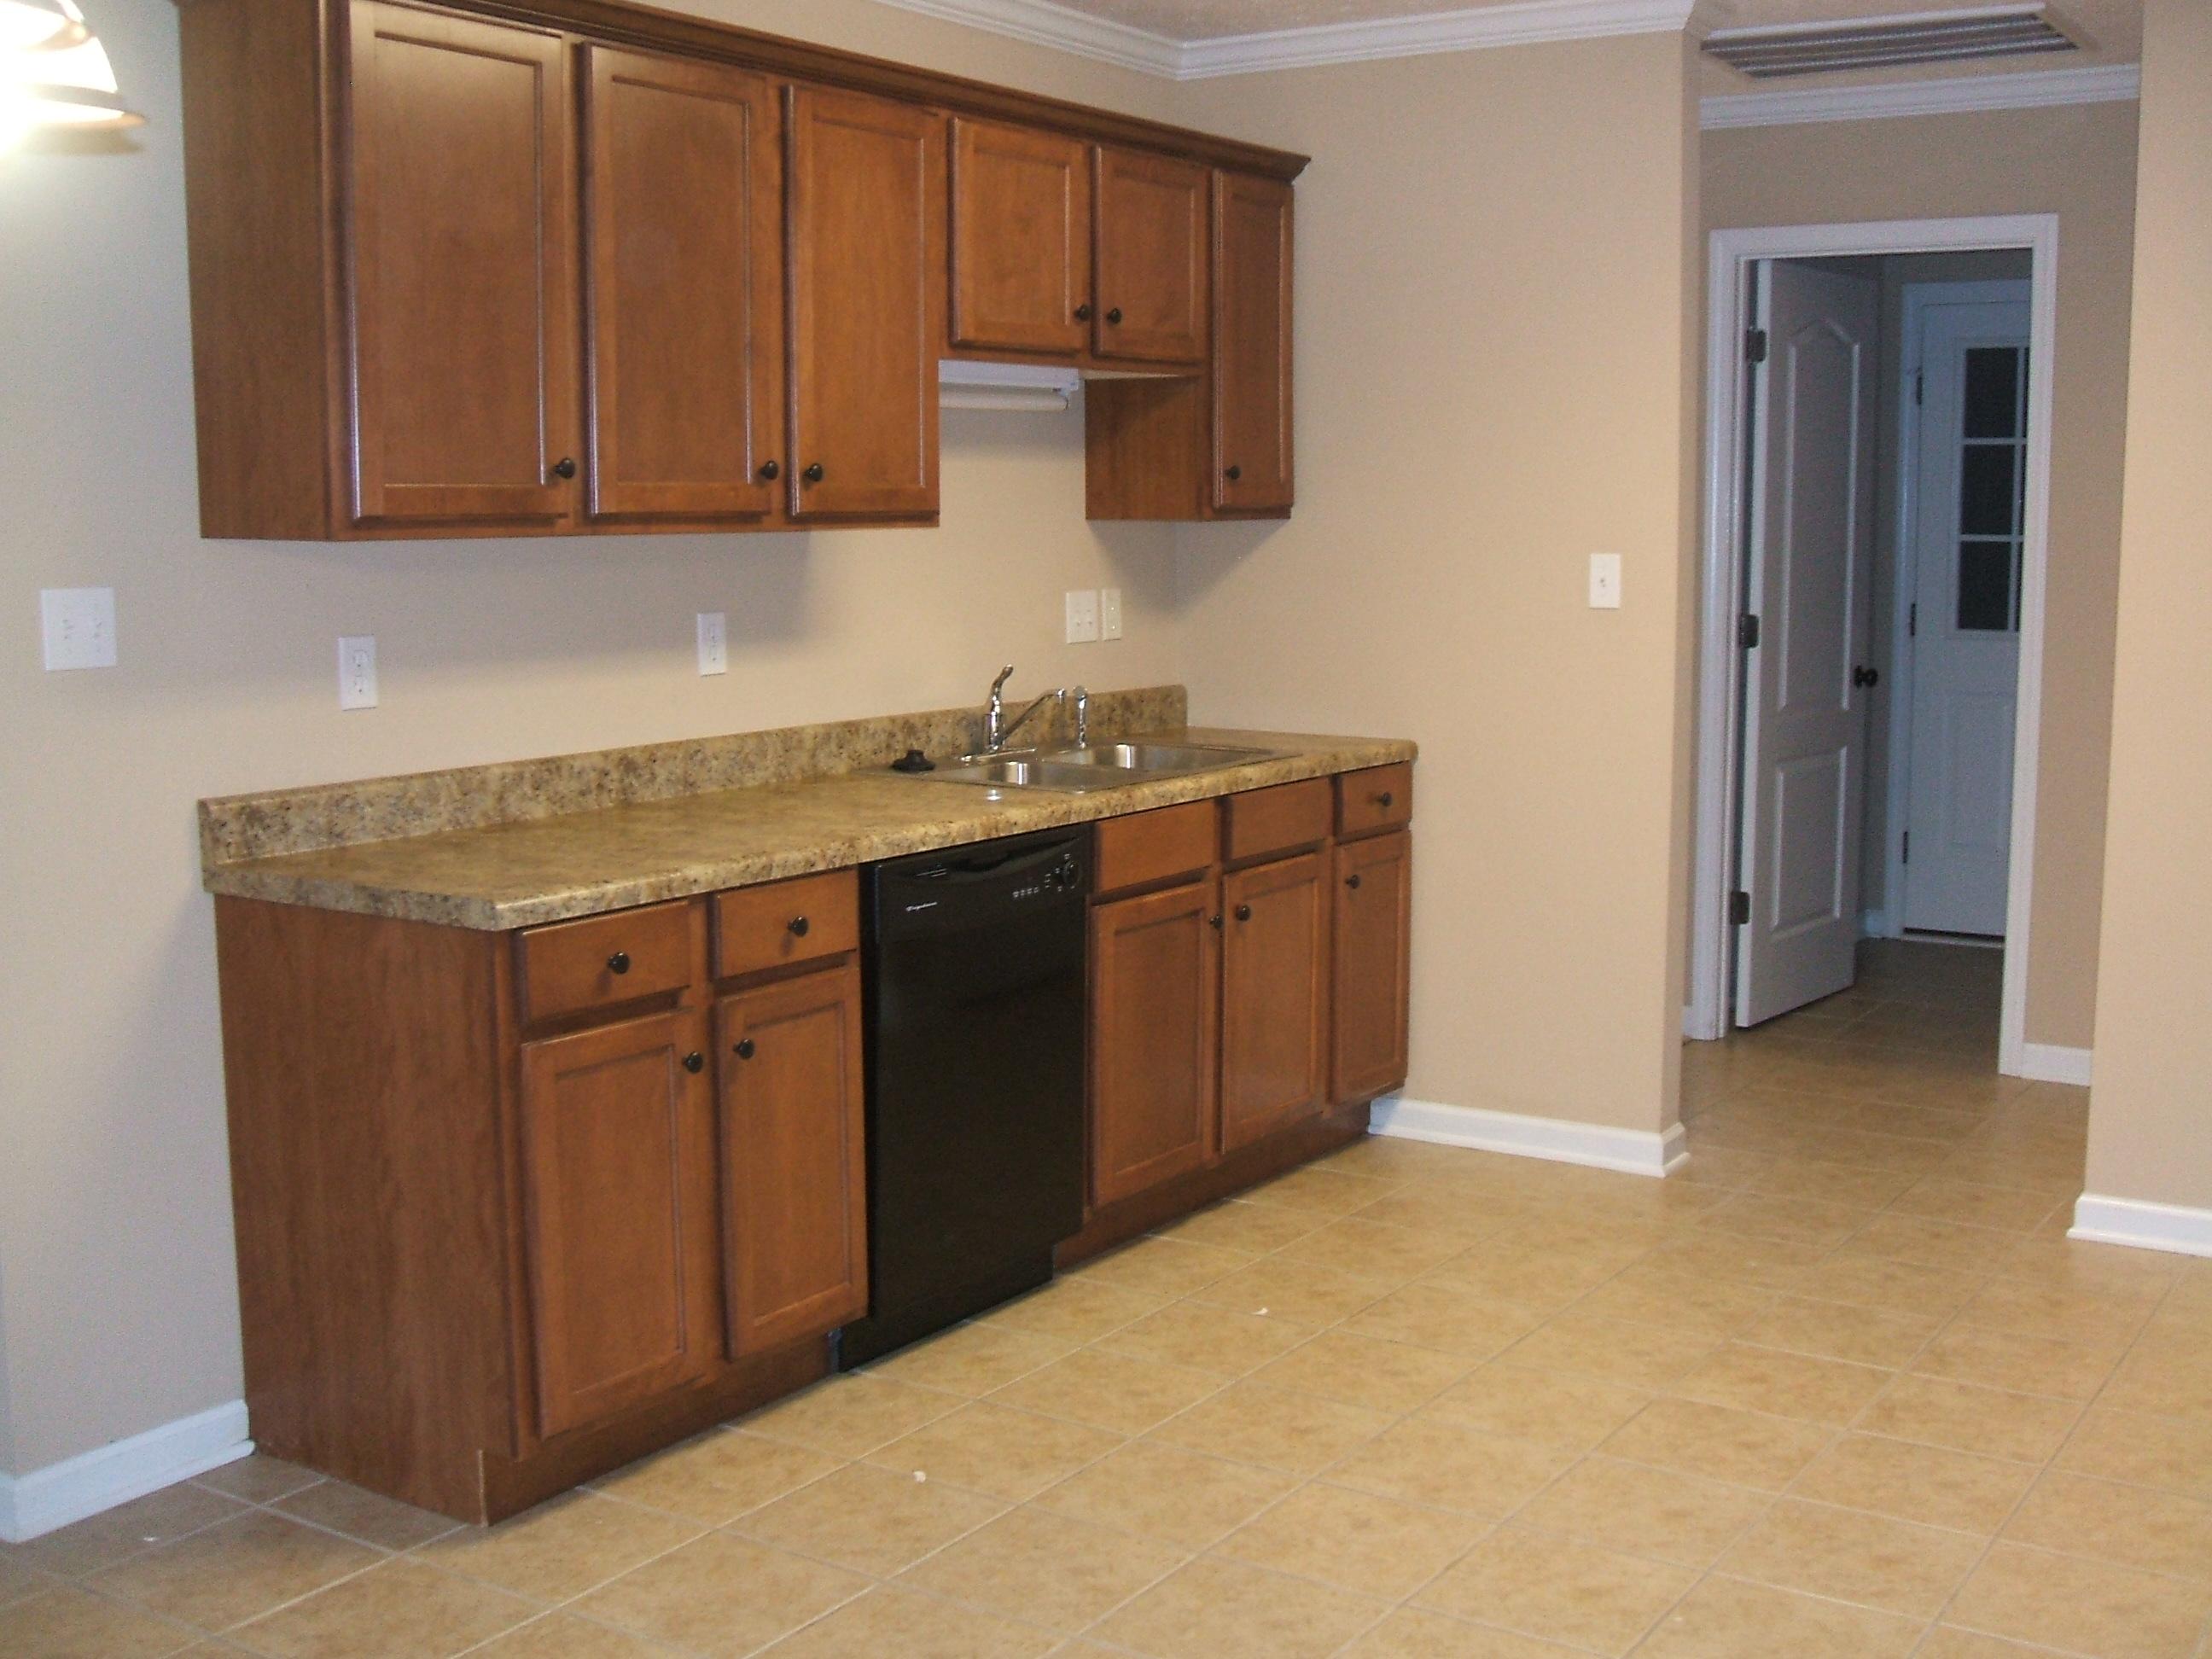 Kitchen Cabinets Jackson Tn 164 julius cove (medina)town and country rentals | jackson, tn